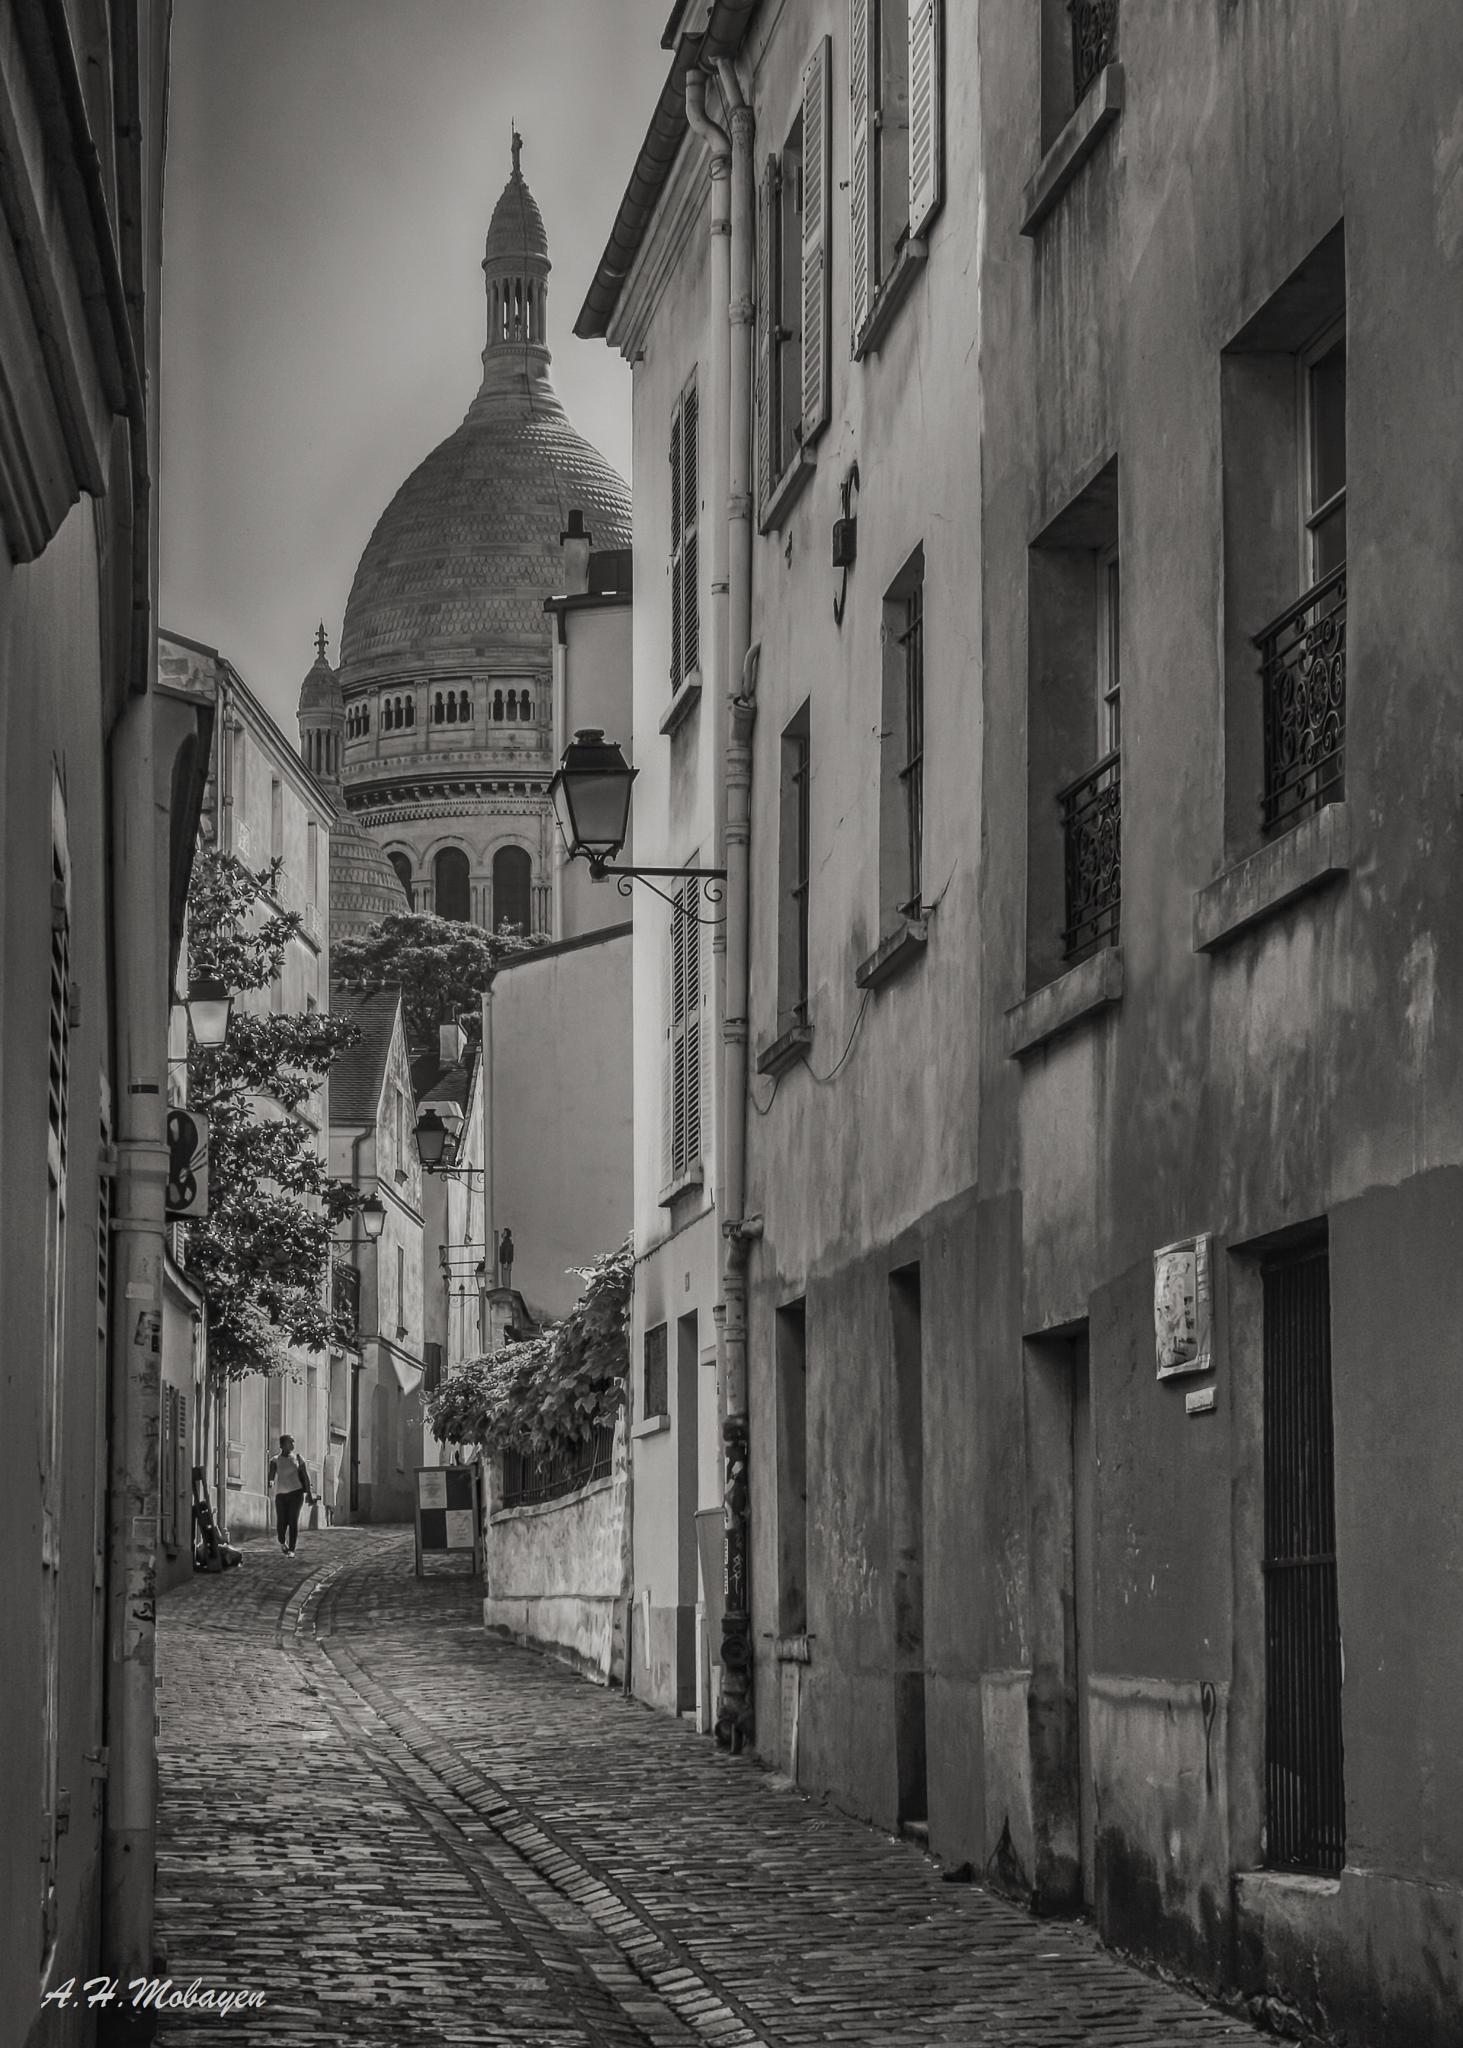 Cathedral by ahmobayen